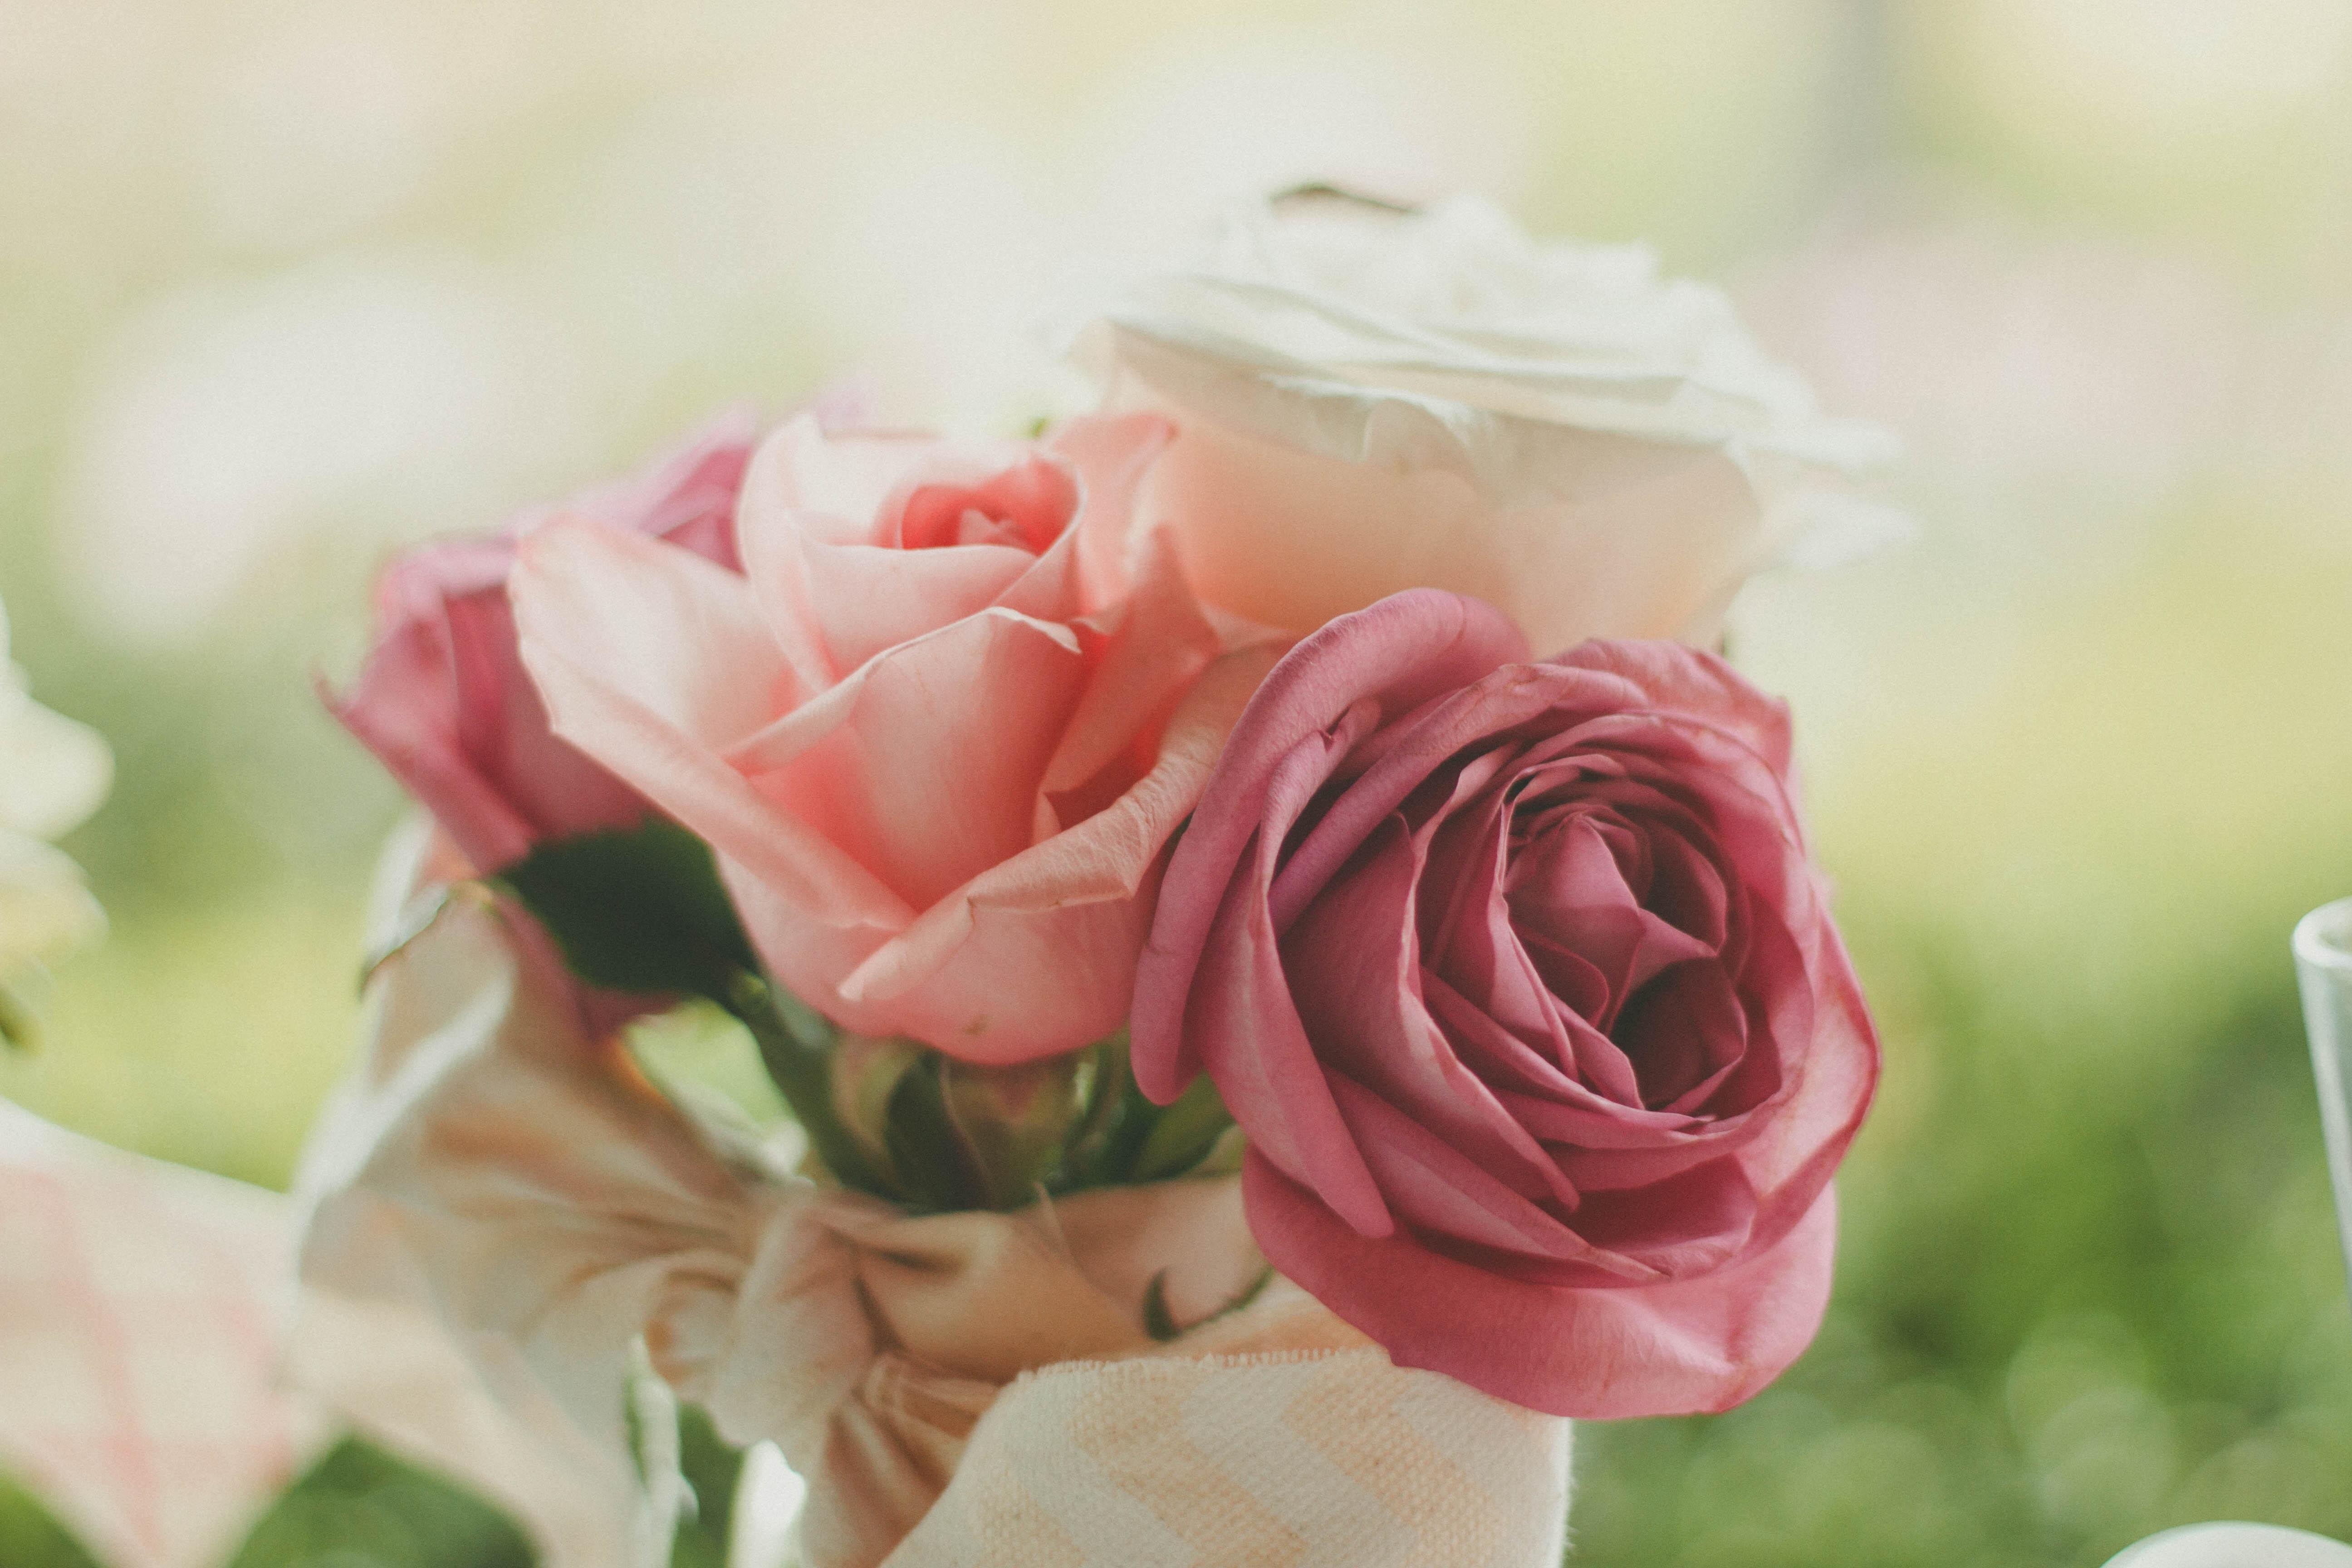 Free Images Blossom Petal Closeup Pink Close Up Floristry